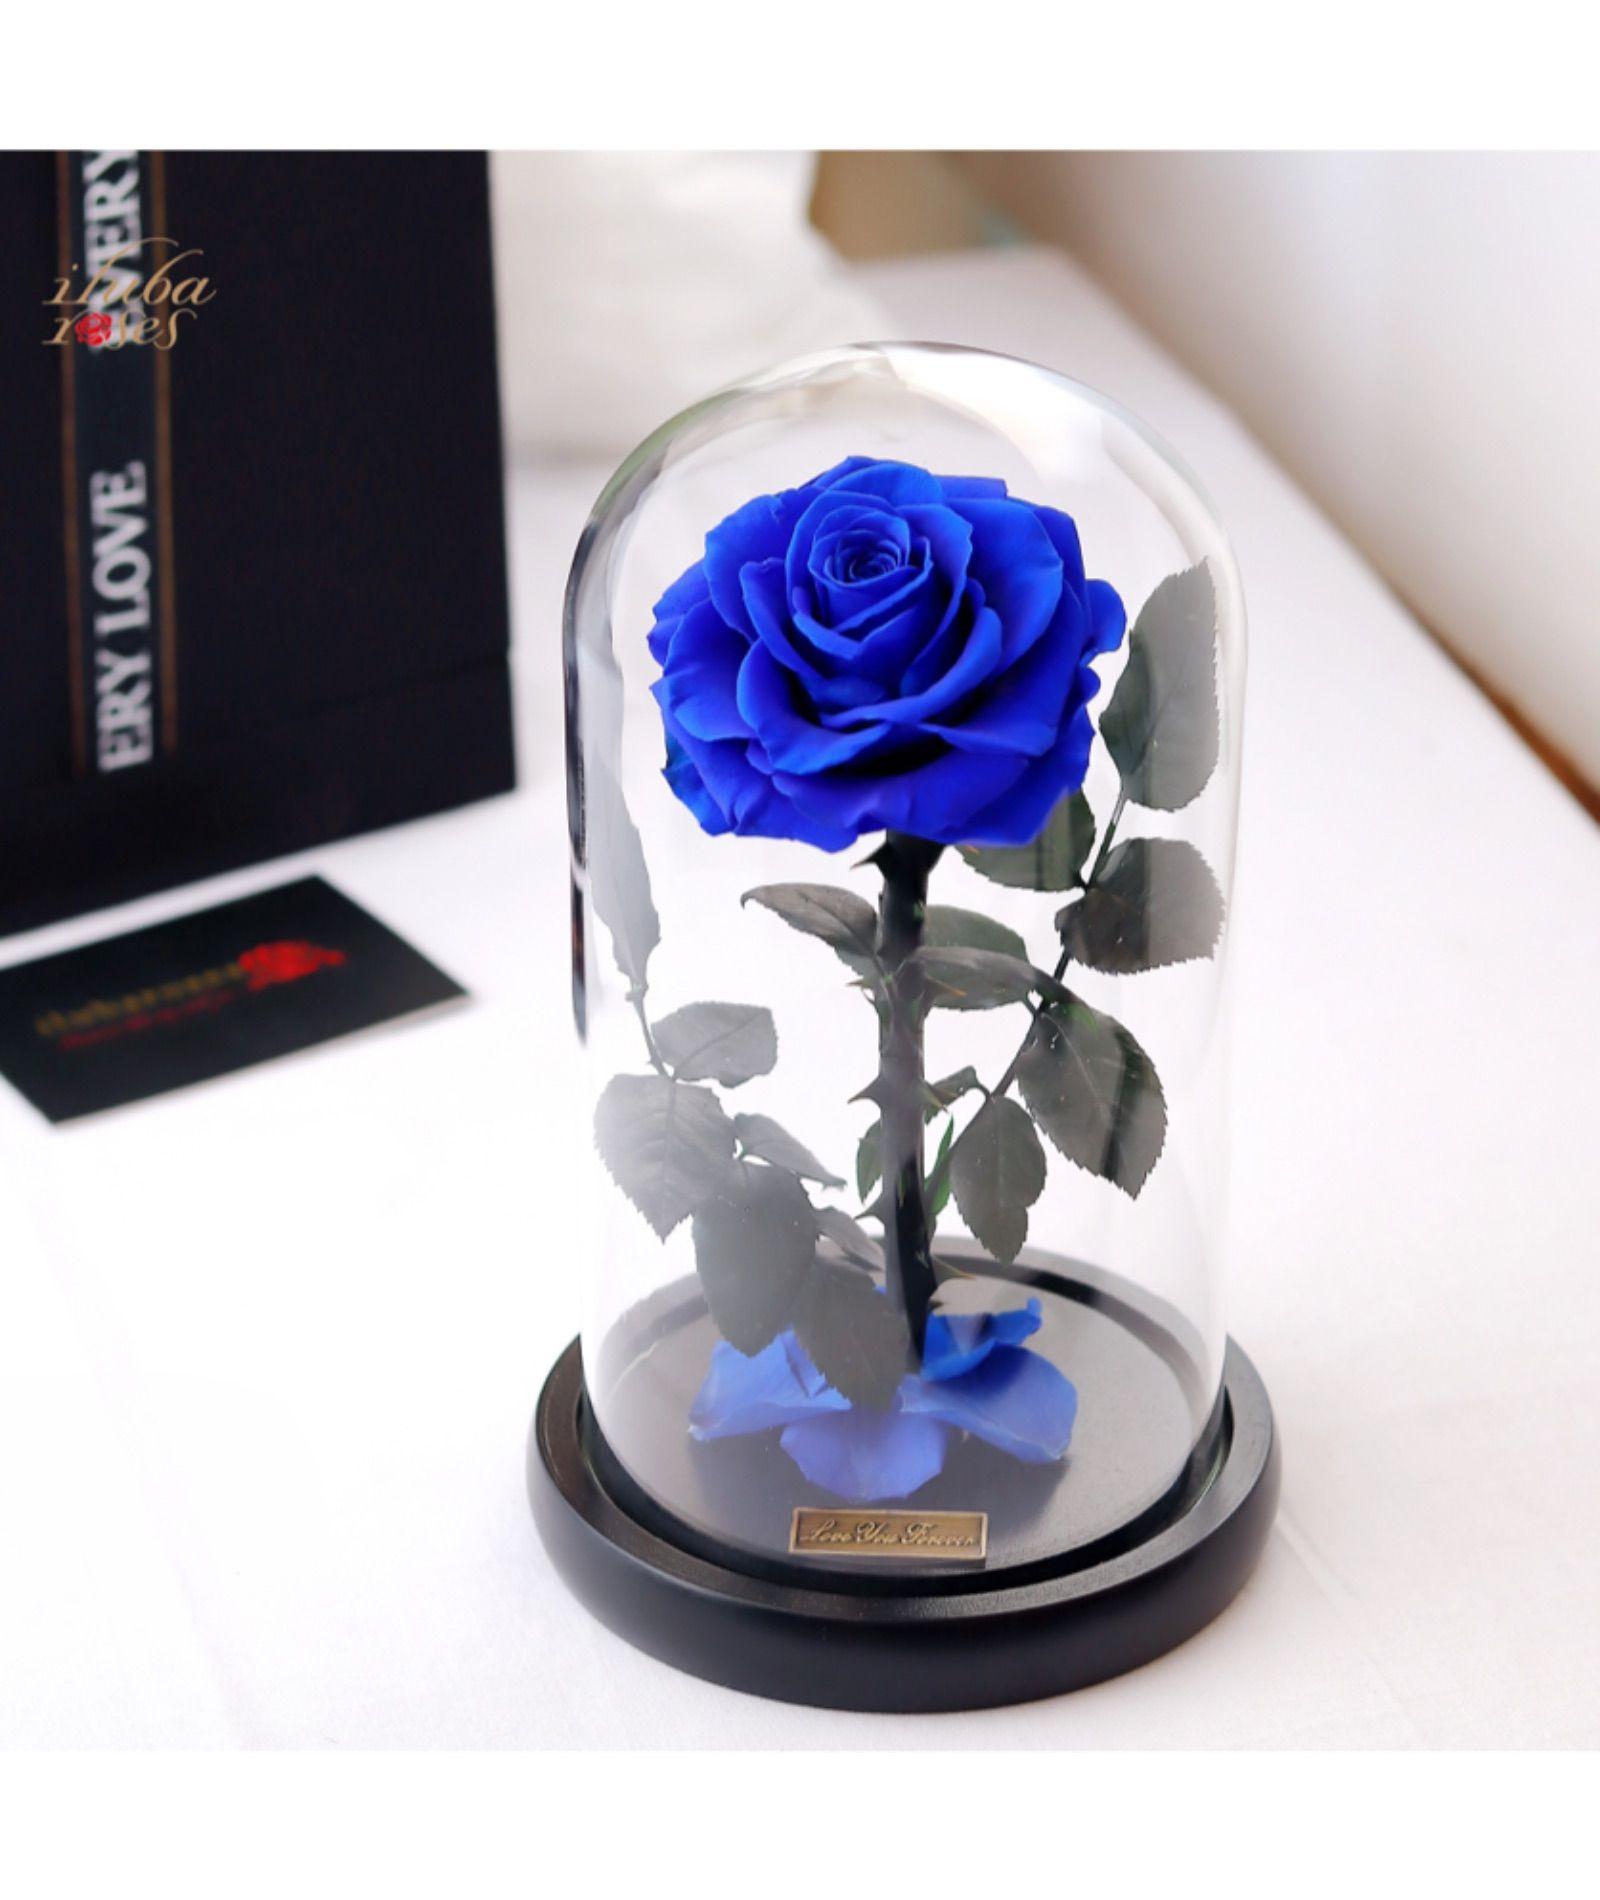 ورد ازرق دائم طبيعي محفوظ ثلاثية Gifts Rose Gift Flower Delivery